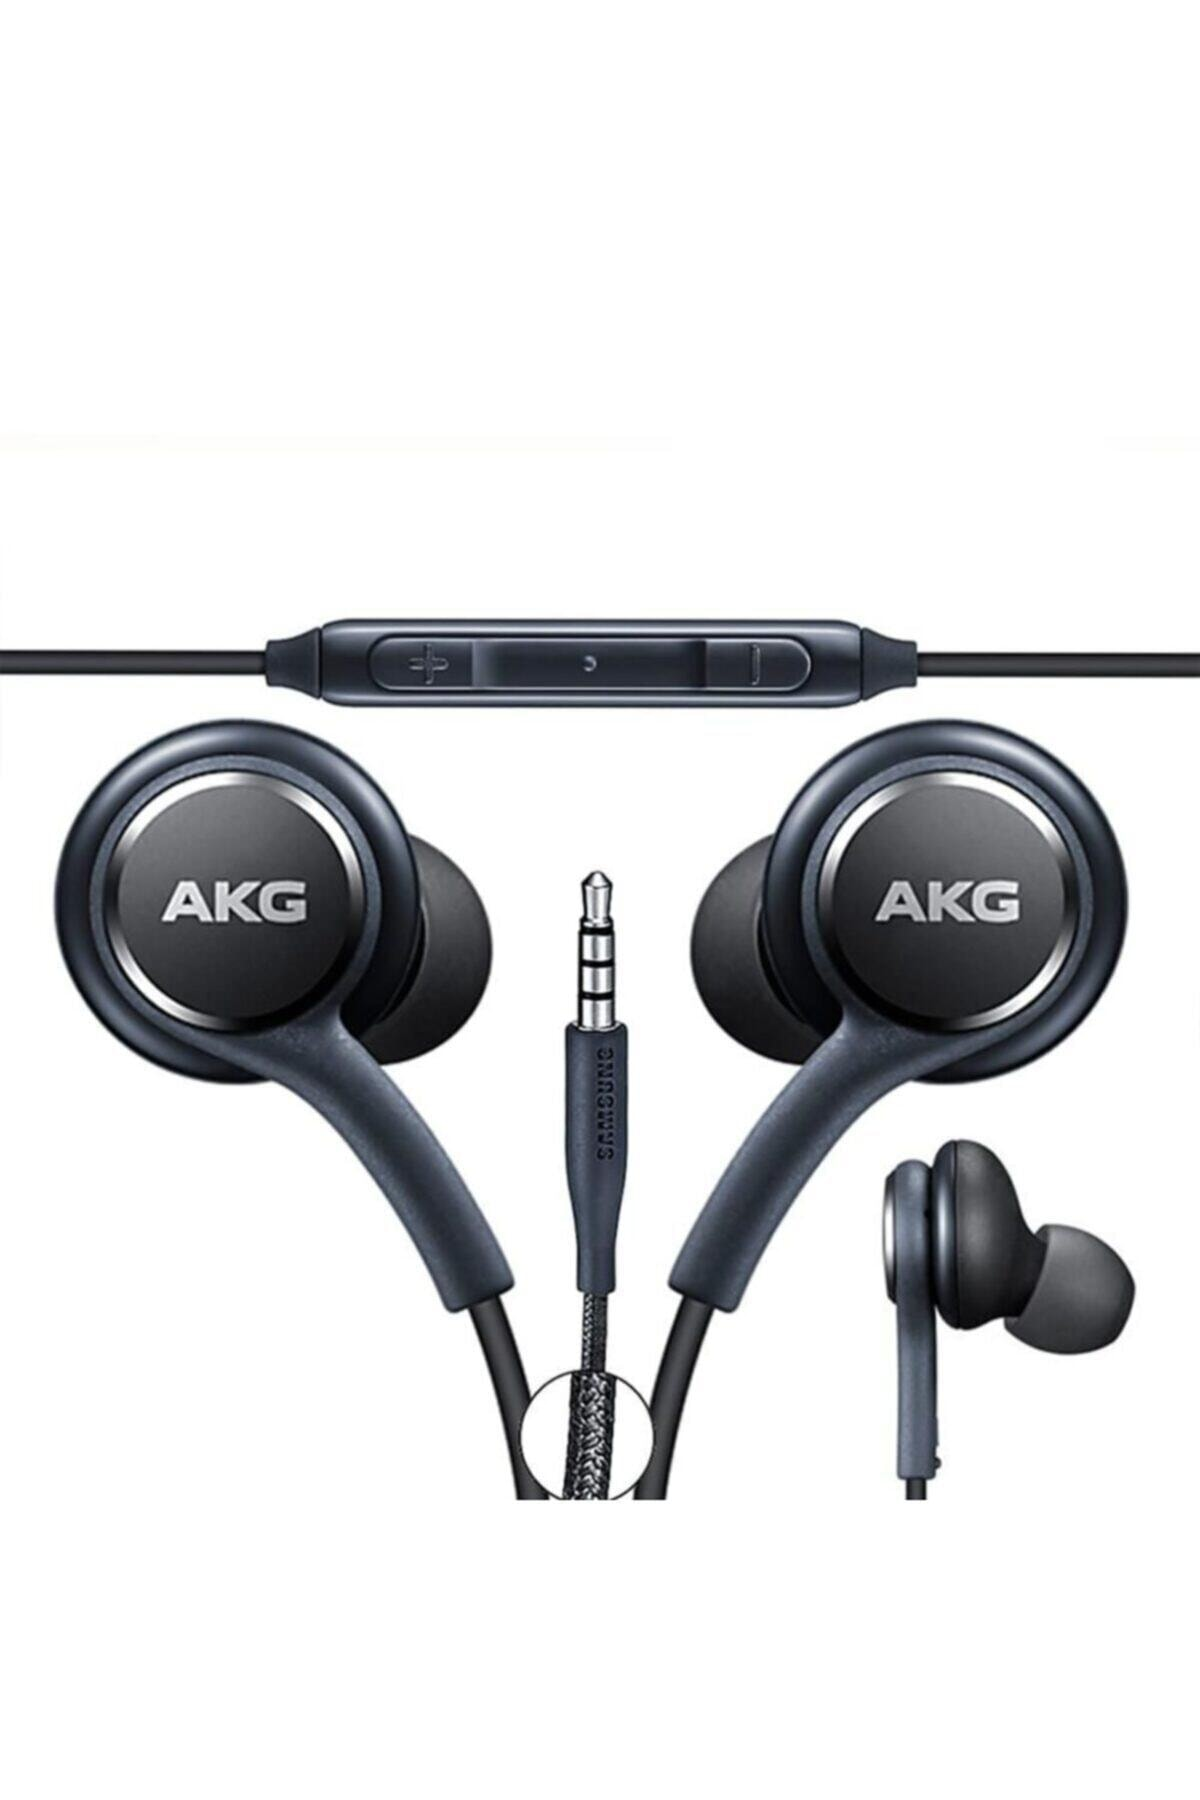 AKG Mikrofonlu Kulaklık 1